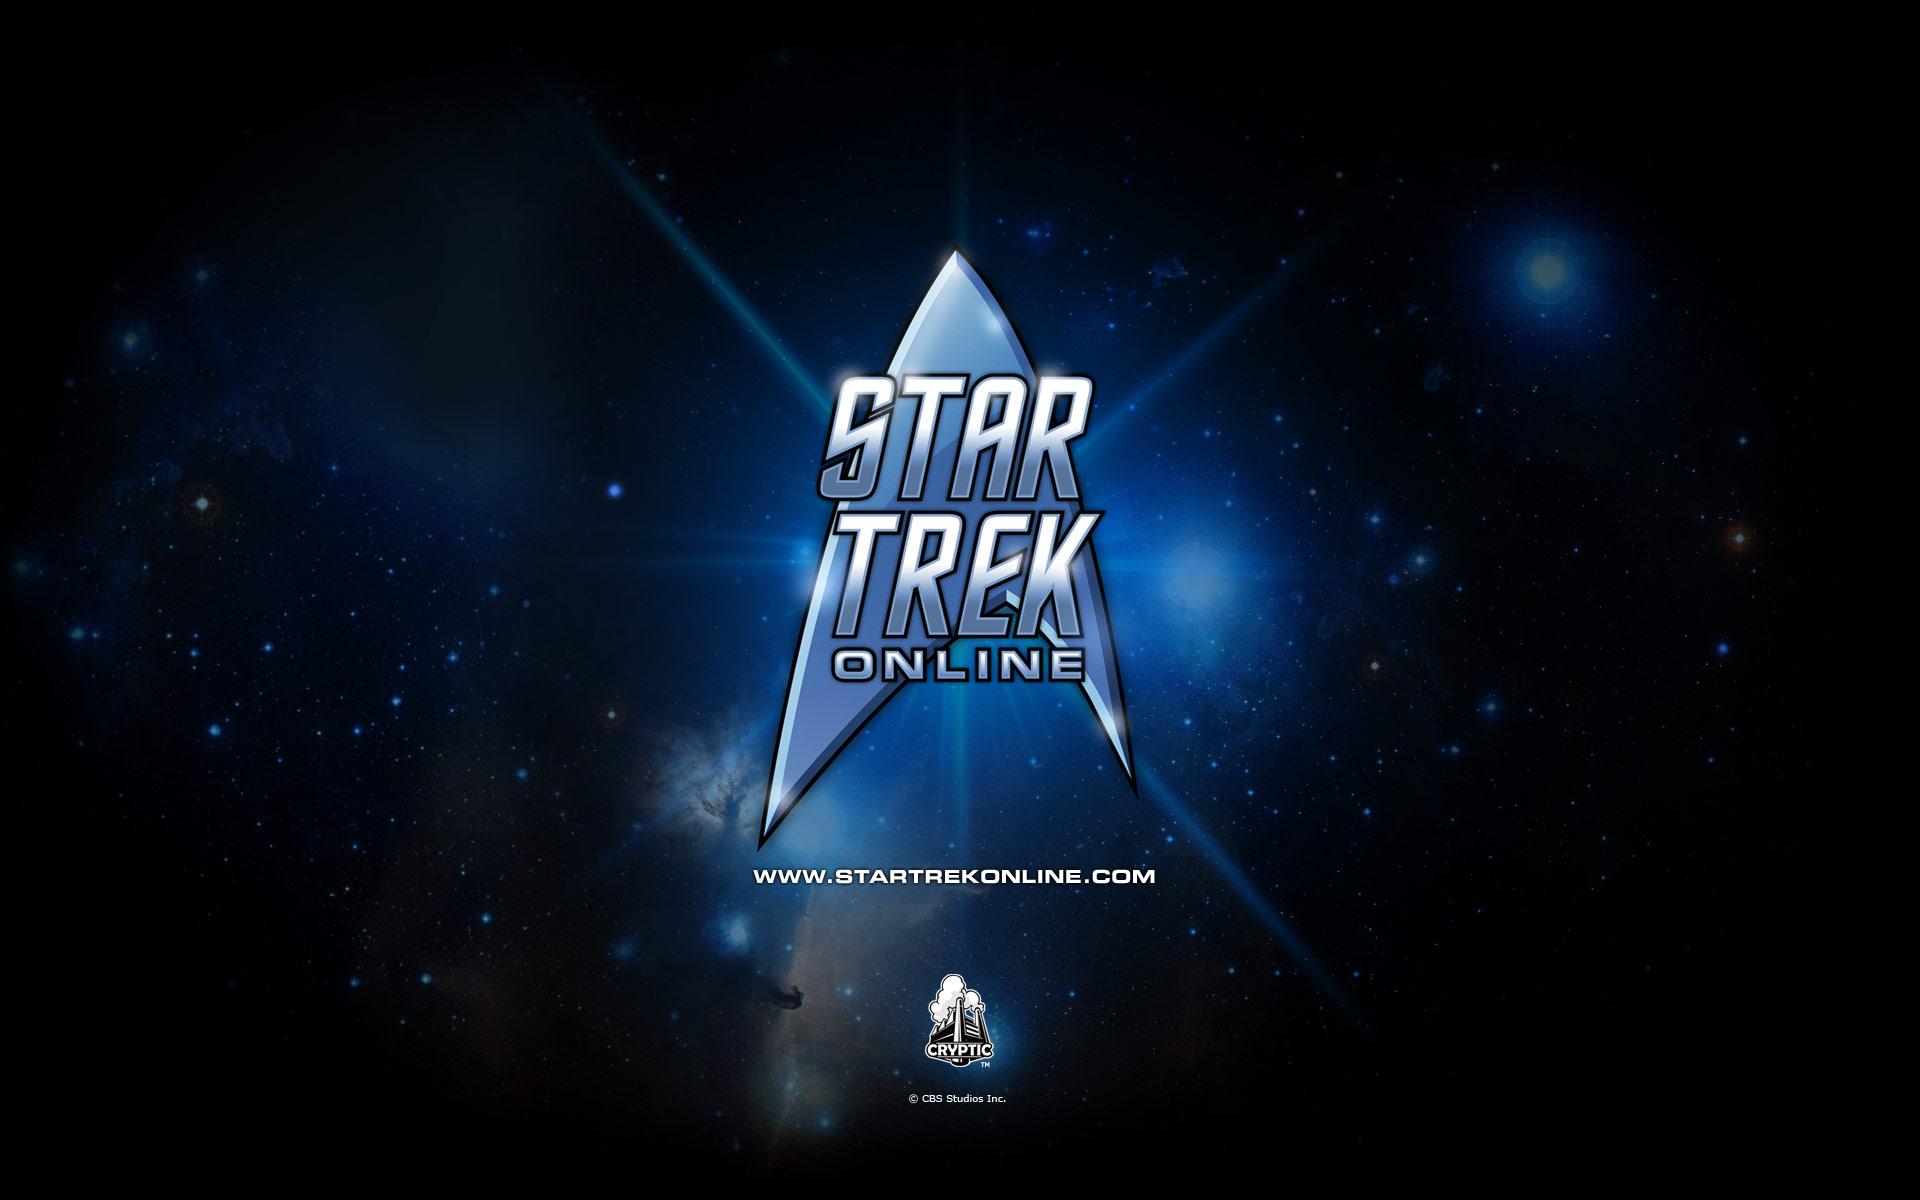 star trek online wallpapers backgrounds mobile 1920x1200 1920x1200